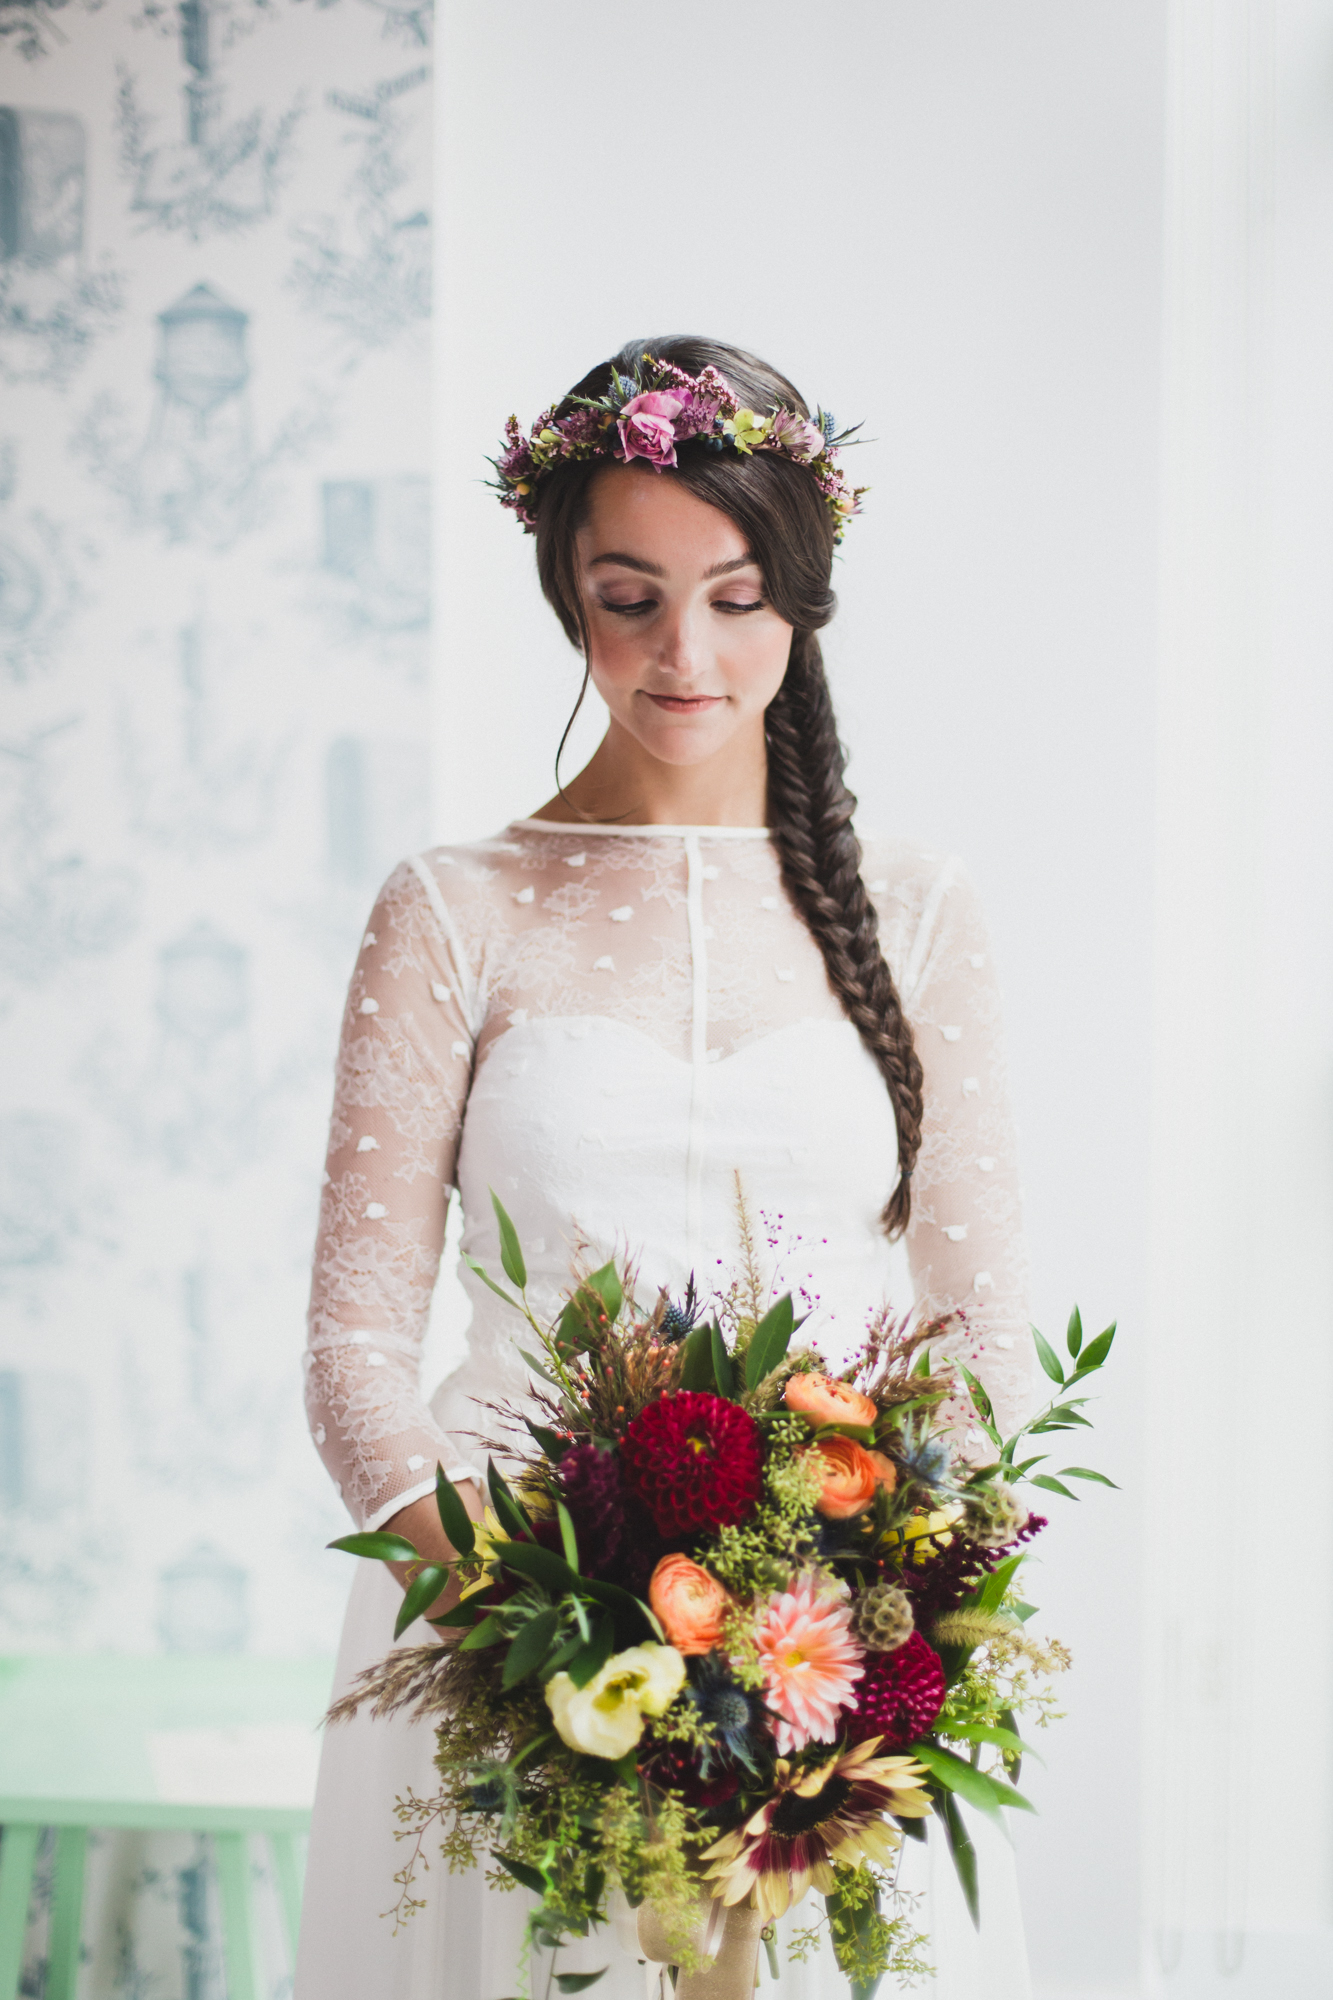 NJ Wedding, Fall Bridal Bouquet, Hair Flowers, Elvira Kaviste Photography